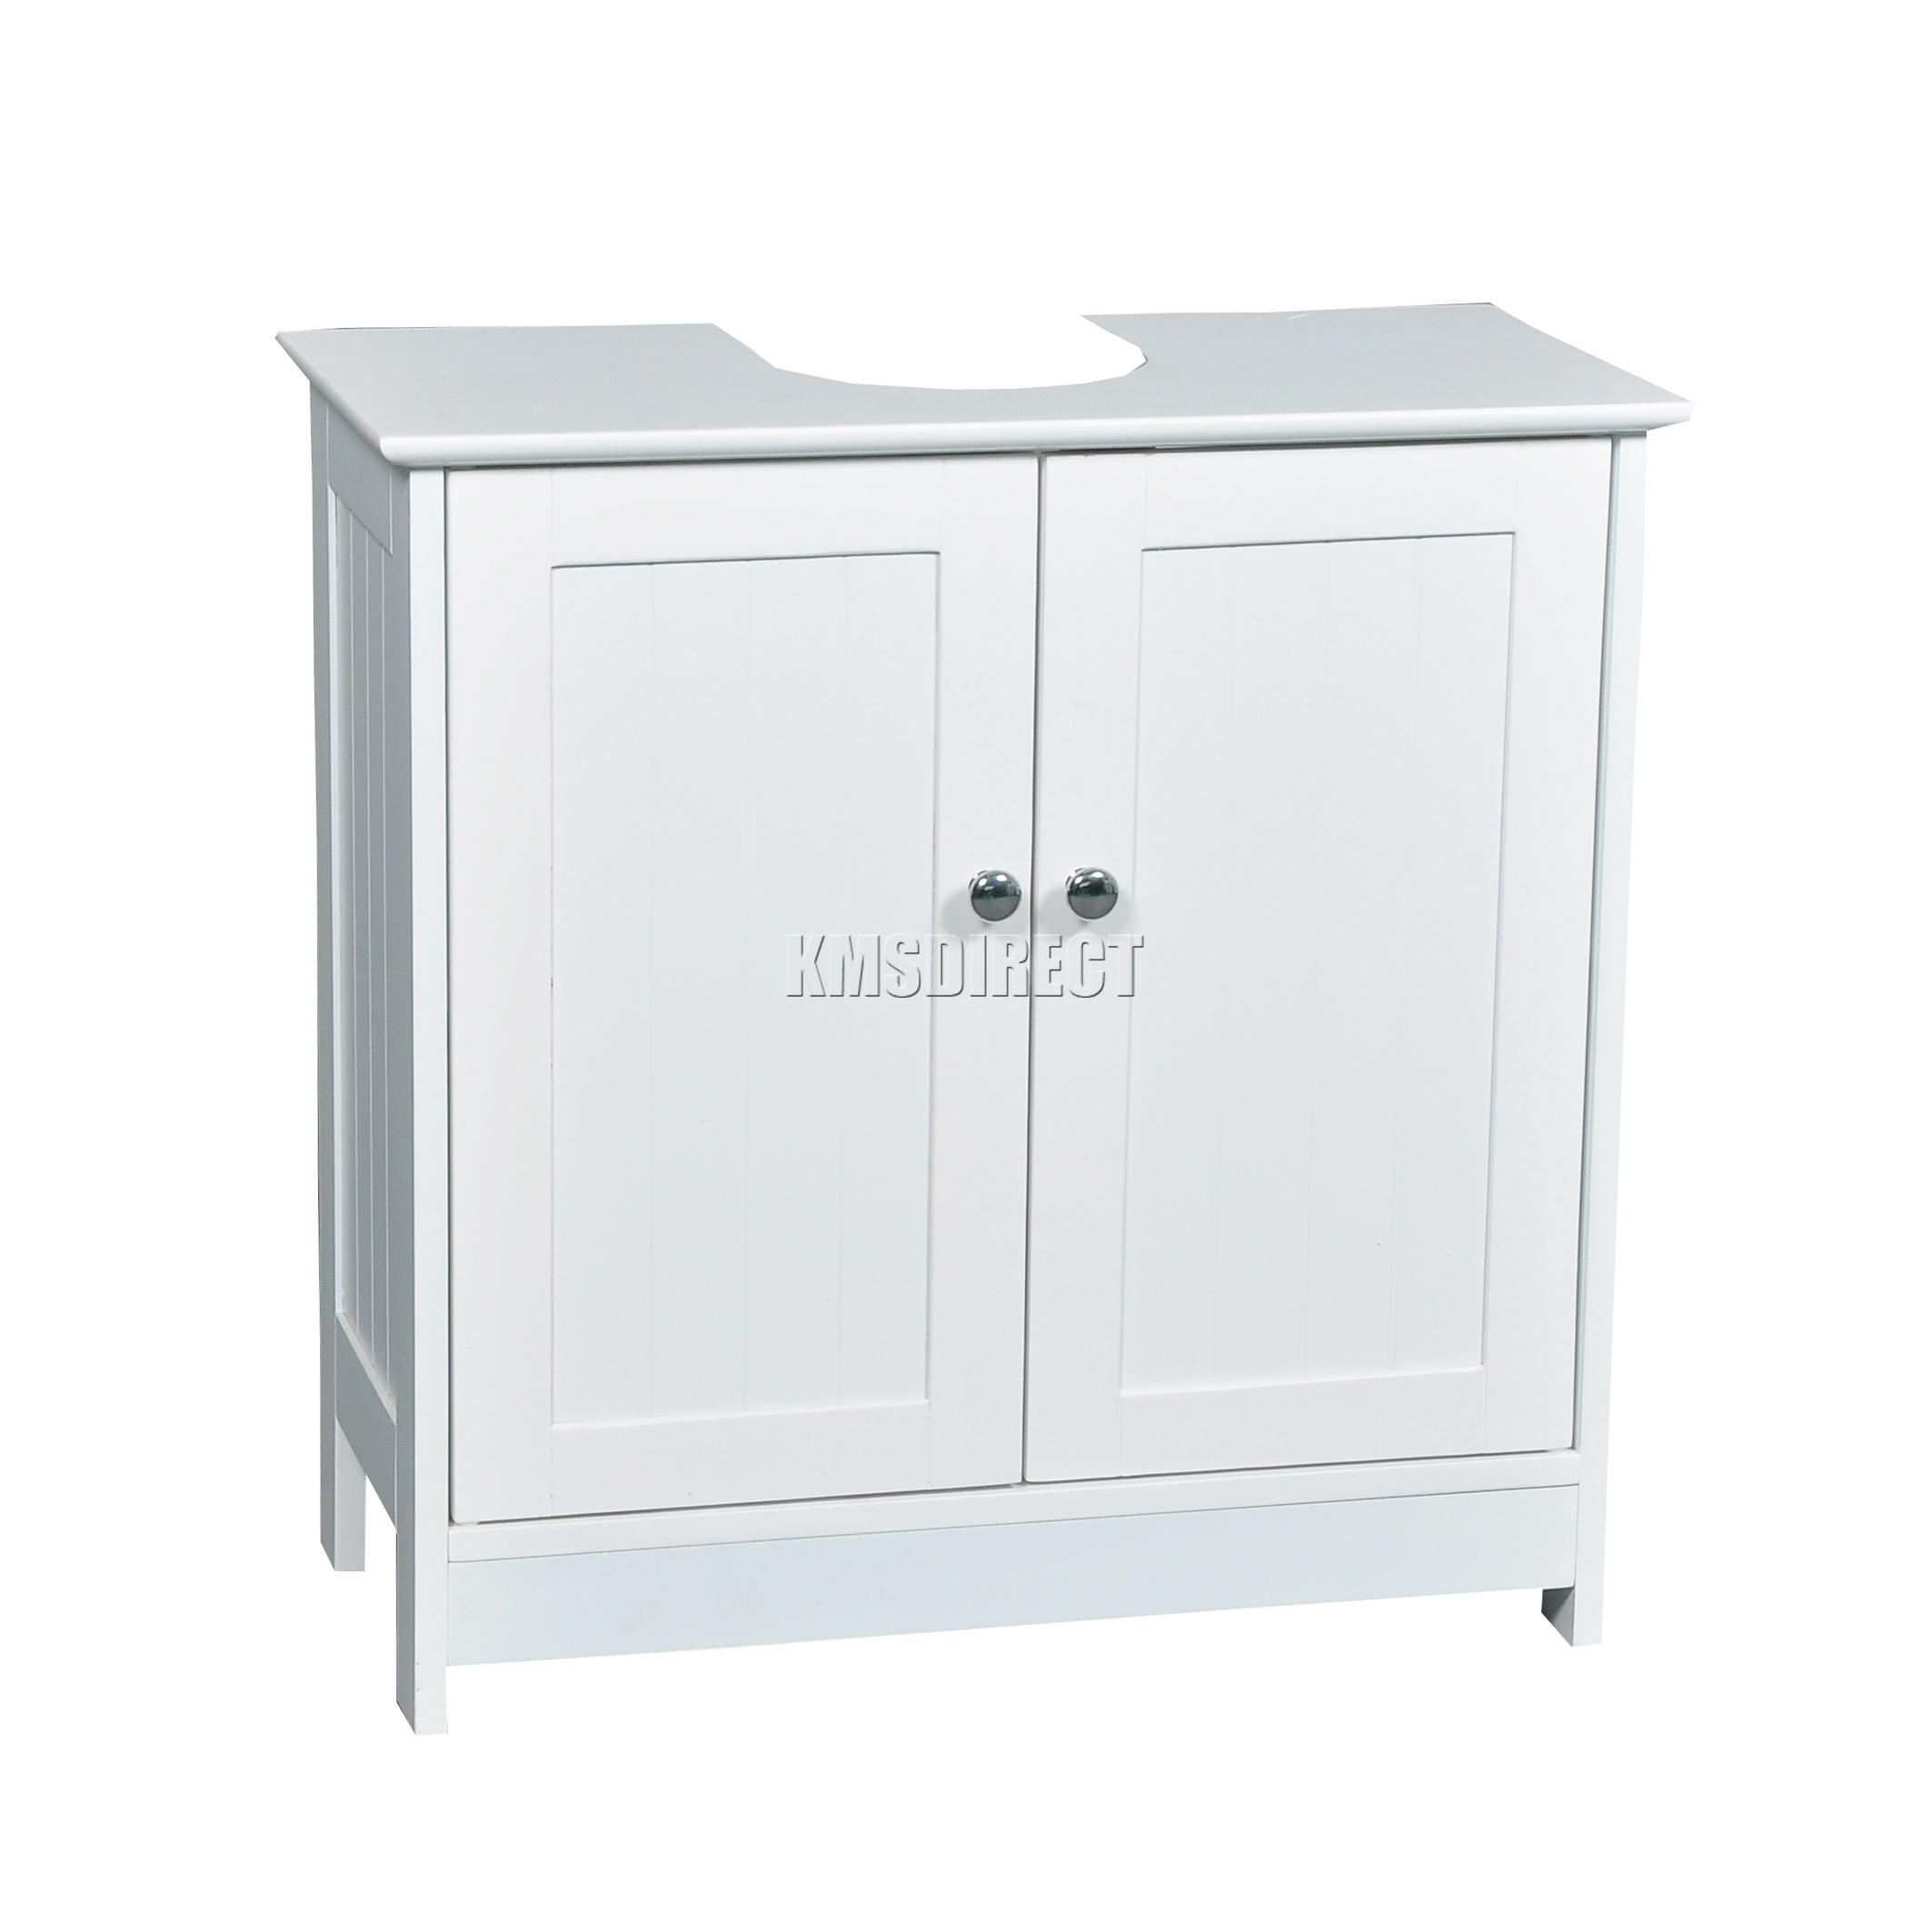 WestWood Vanity Unit Wooden Under Sink Wash Basin Bathroom Cabinet ...